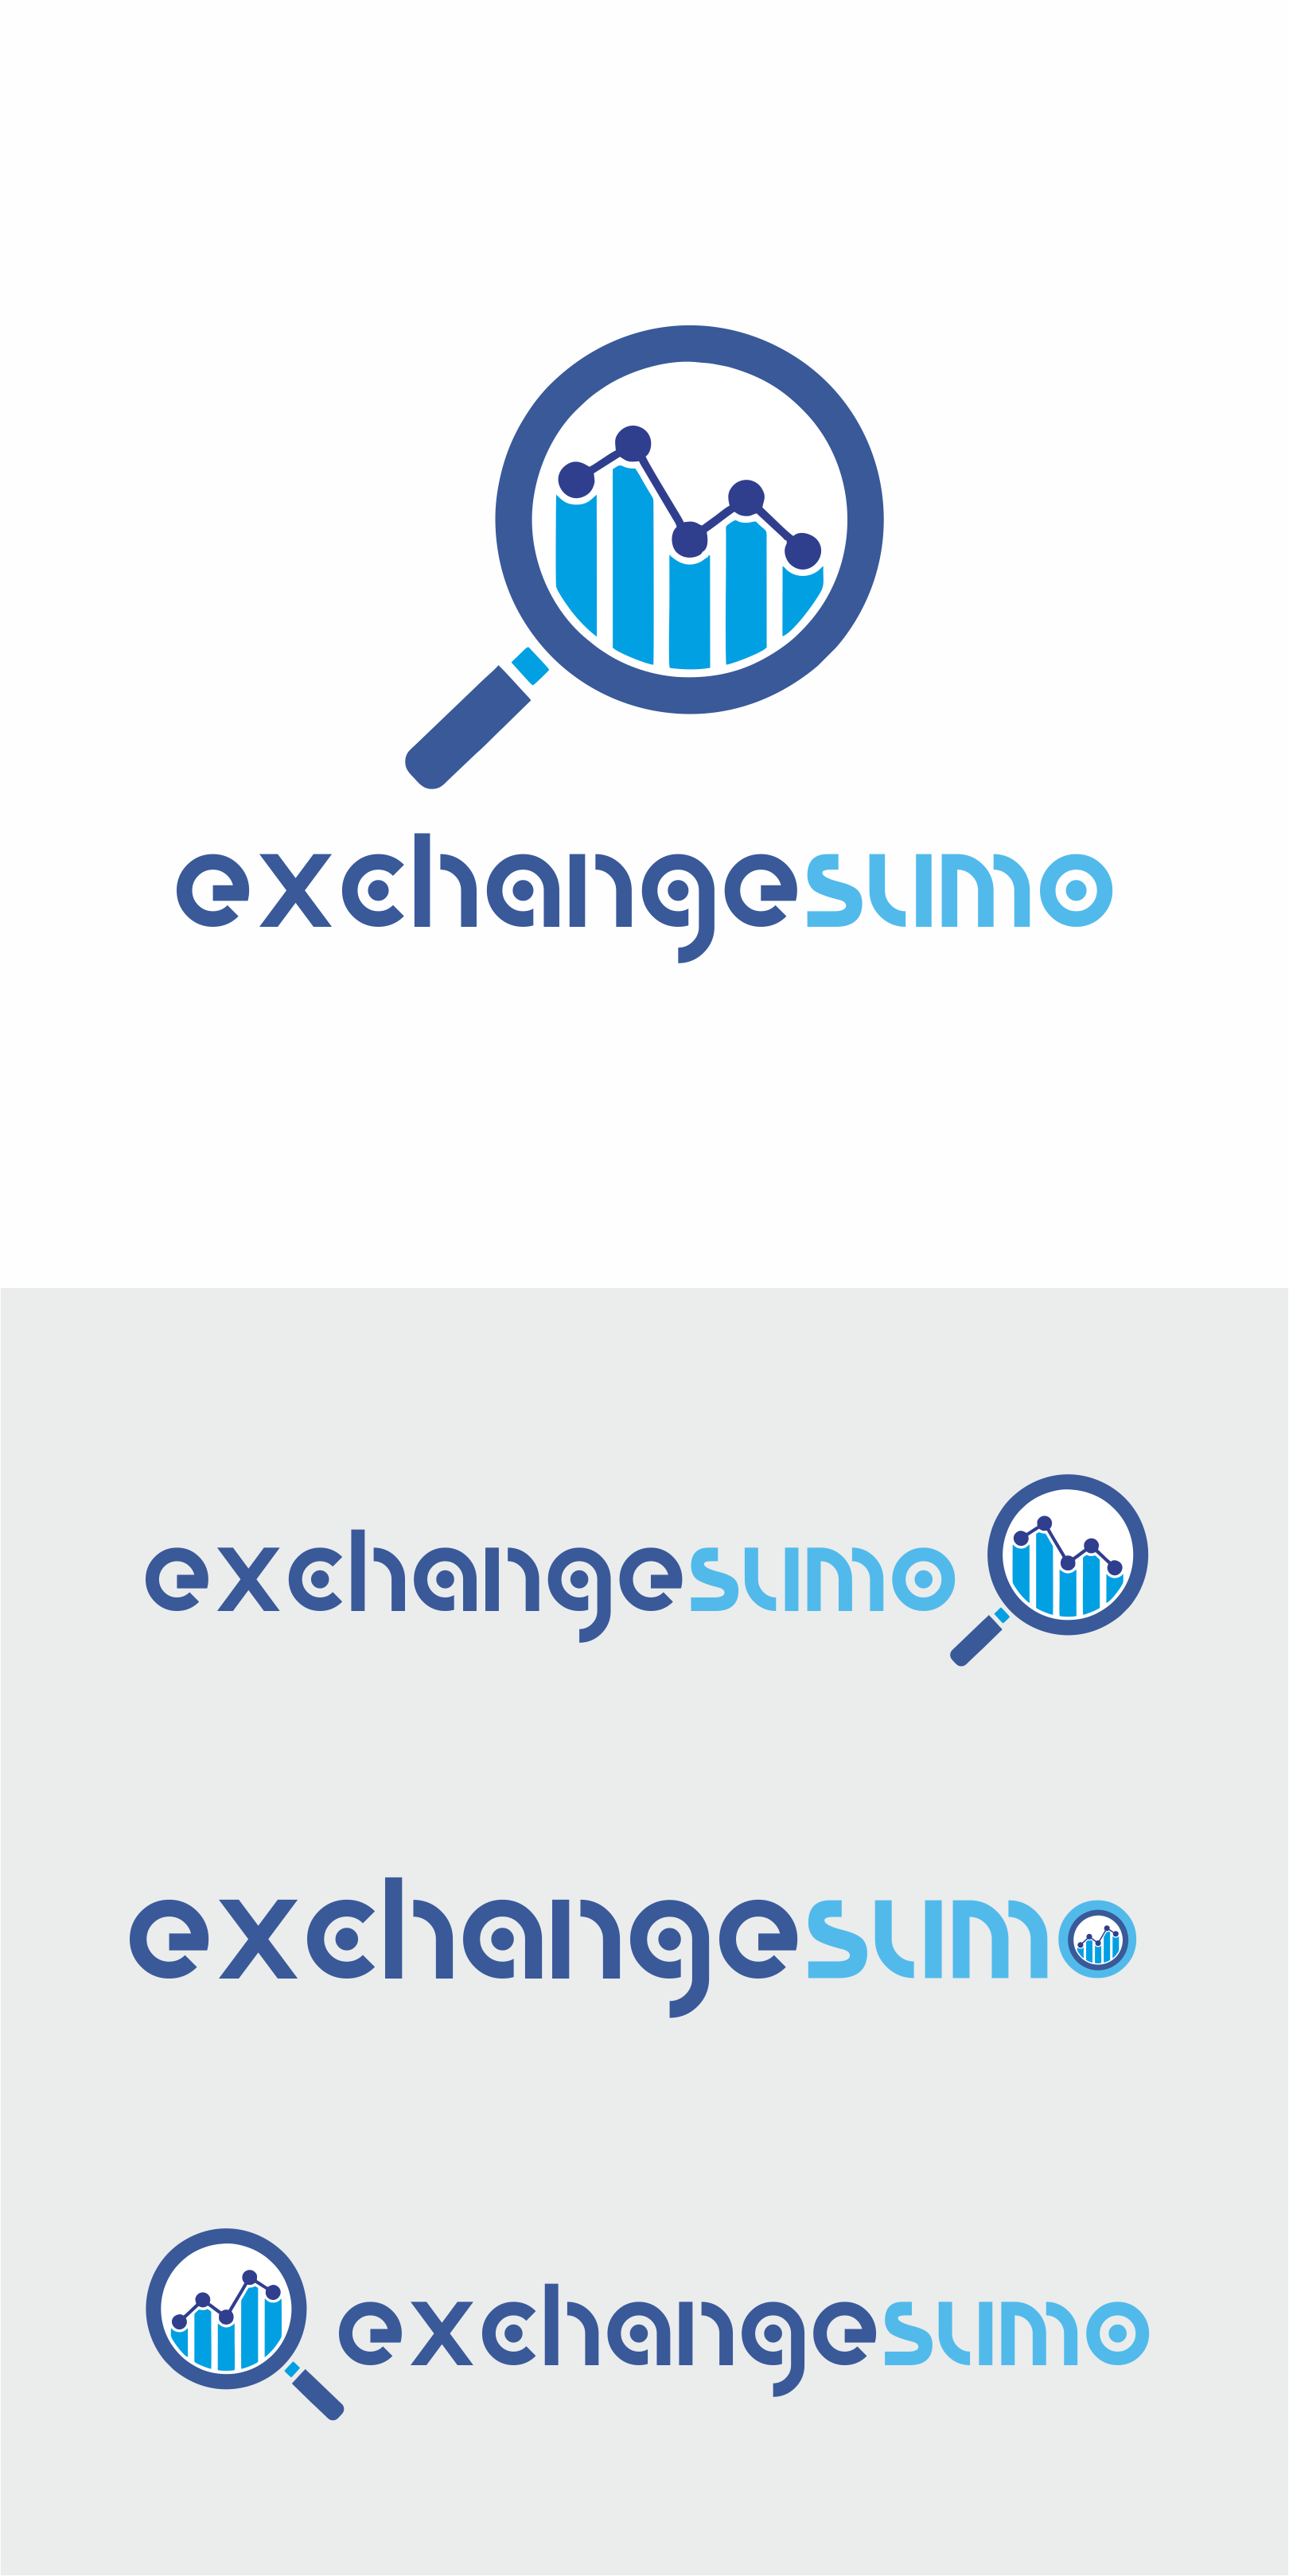 Логотип для мониторинга обменников фото f_8525bab906ef2183.png